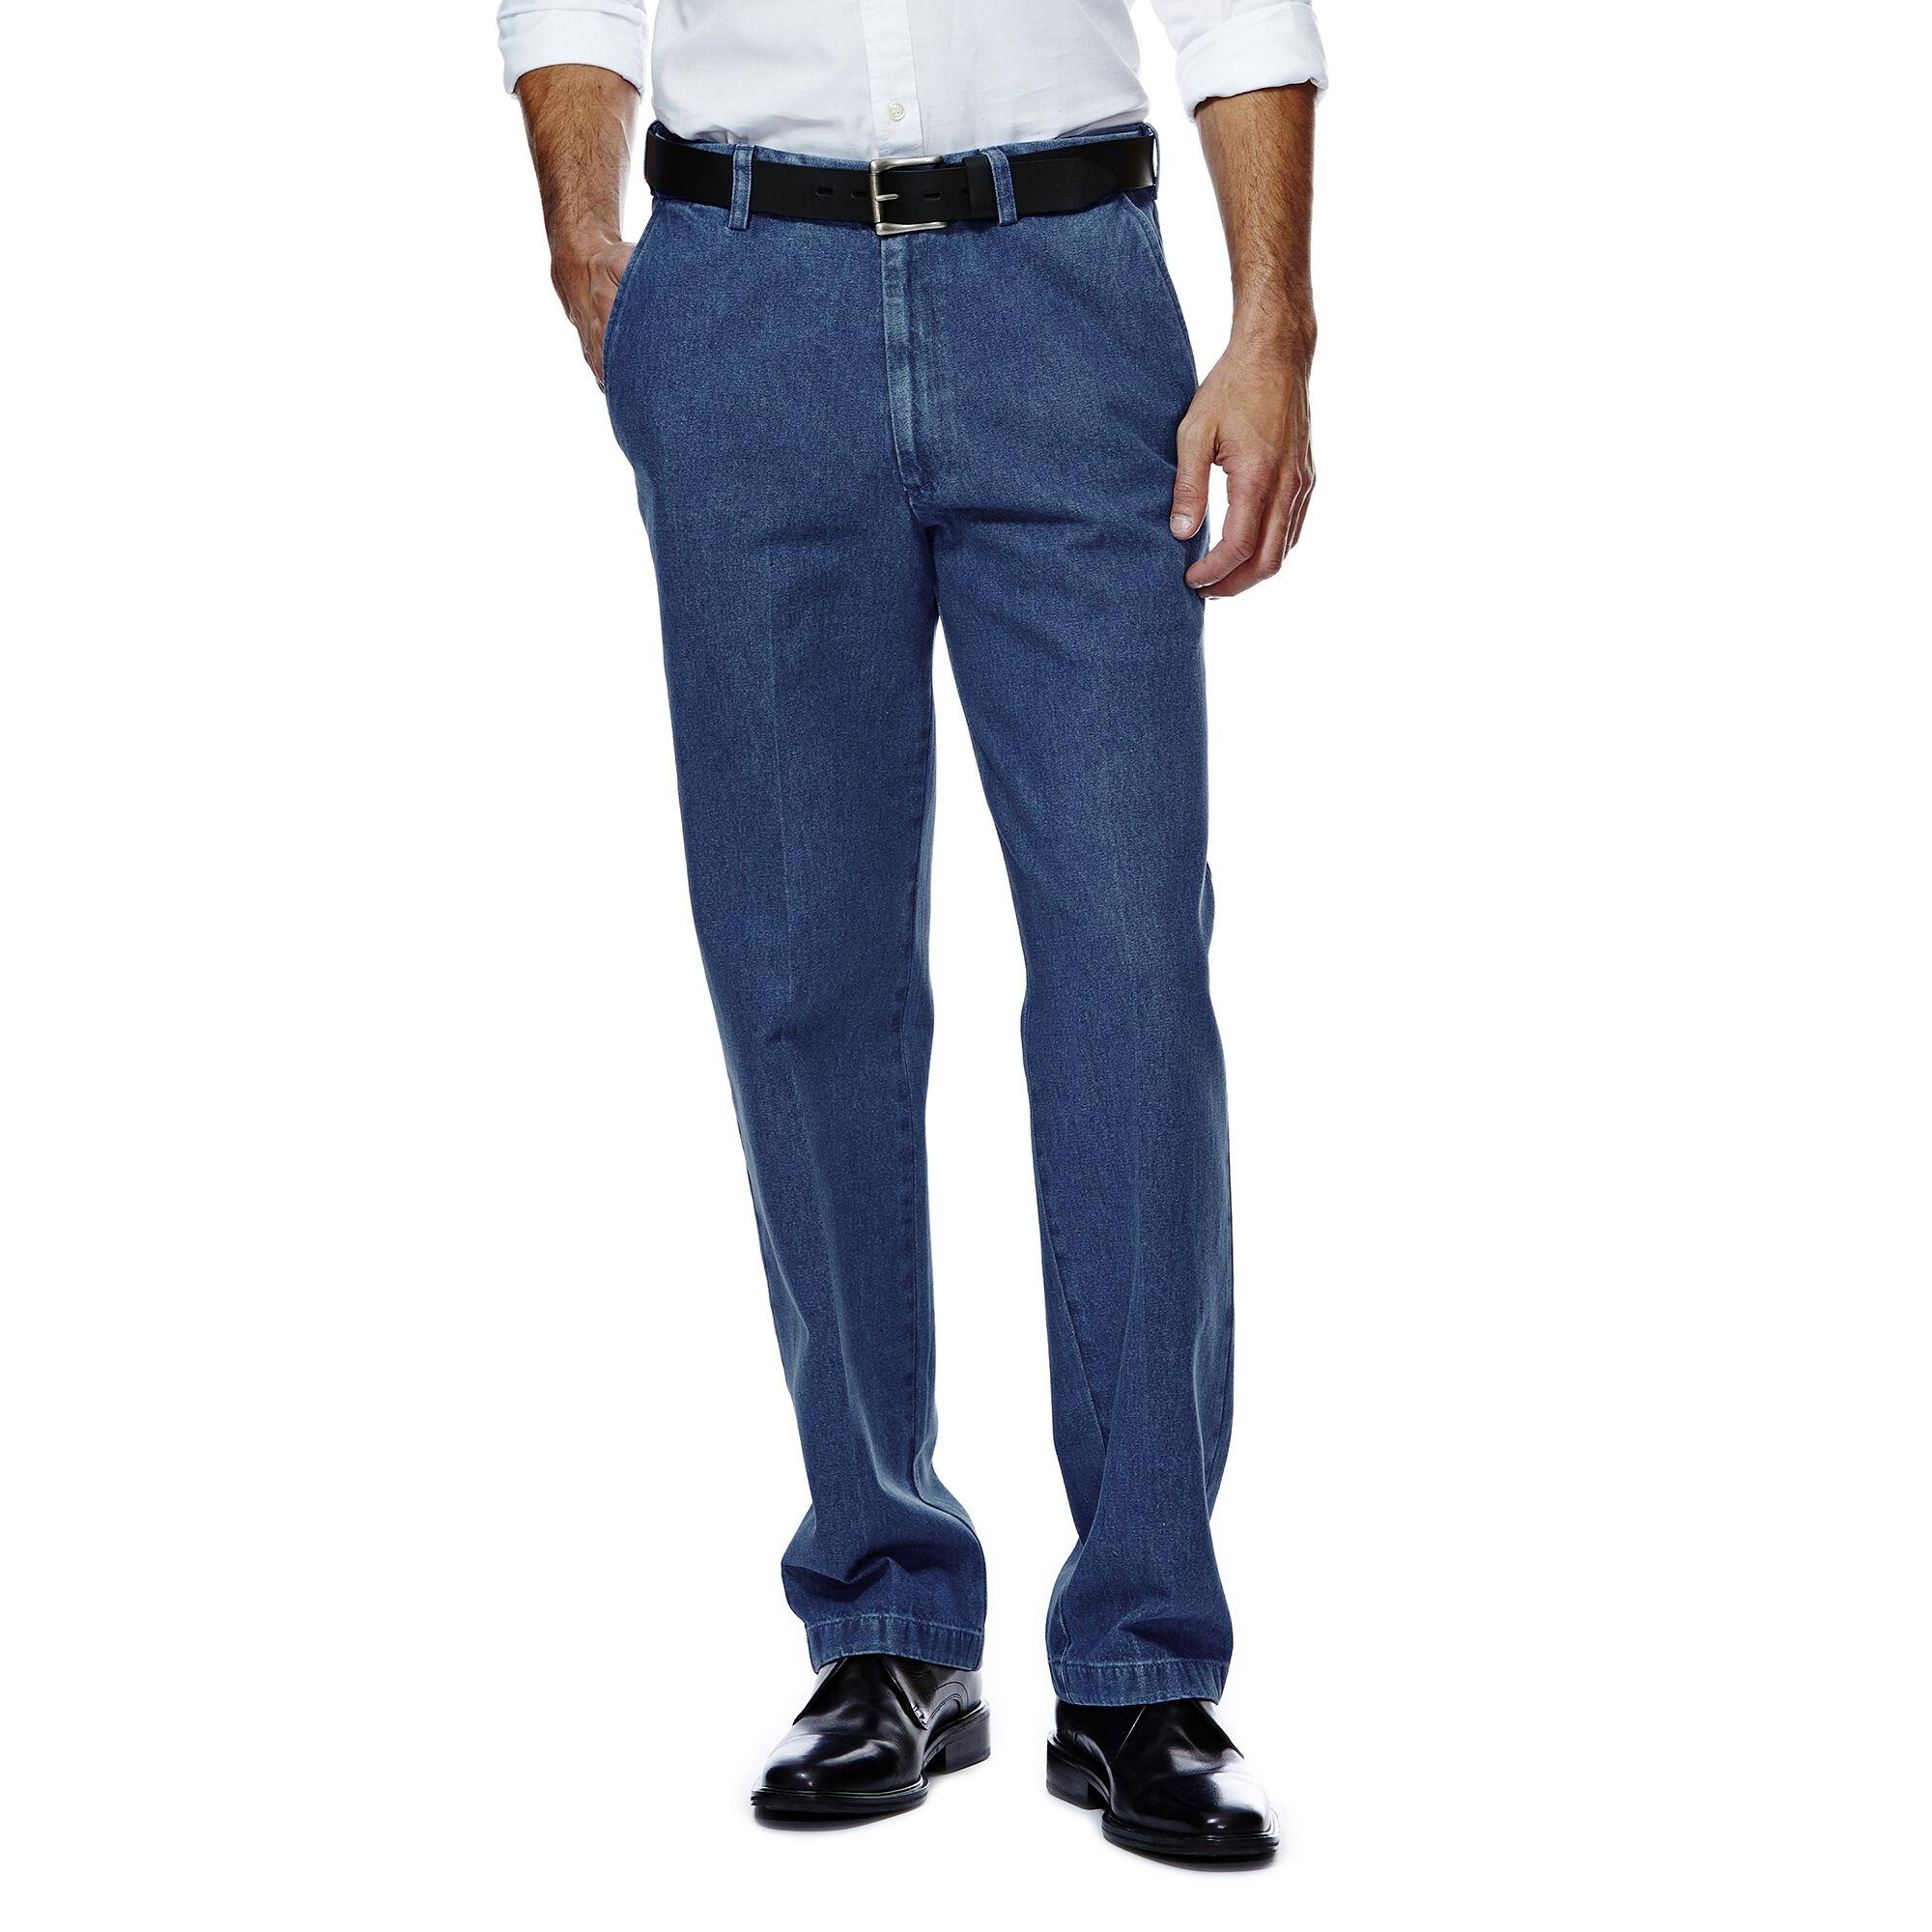 jeans fit expandable haggar hidden iron com work to flat denim waistband weekend comfort no waist comforter classic front